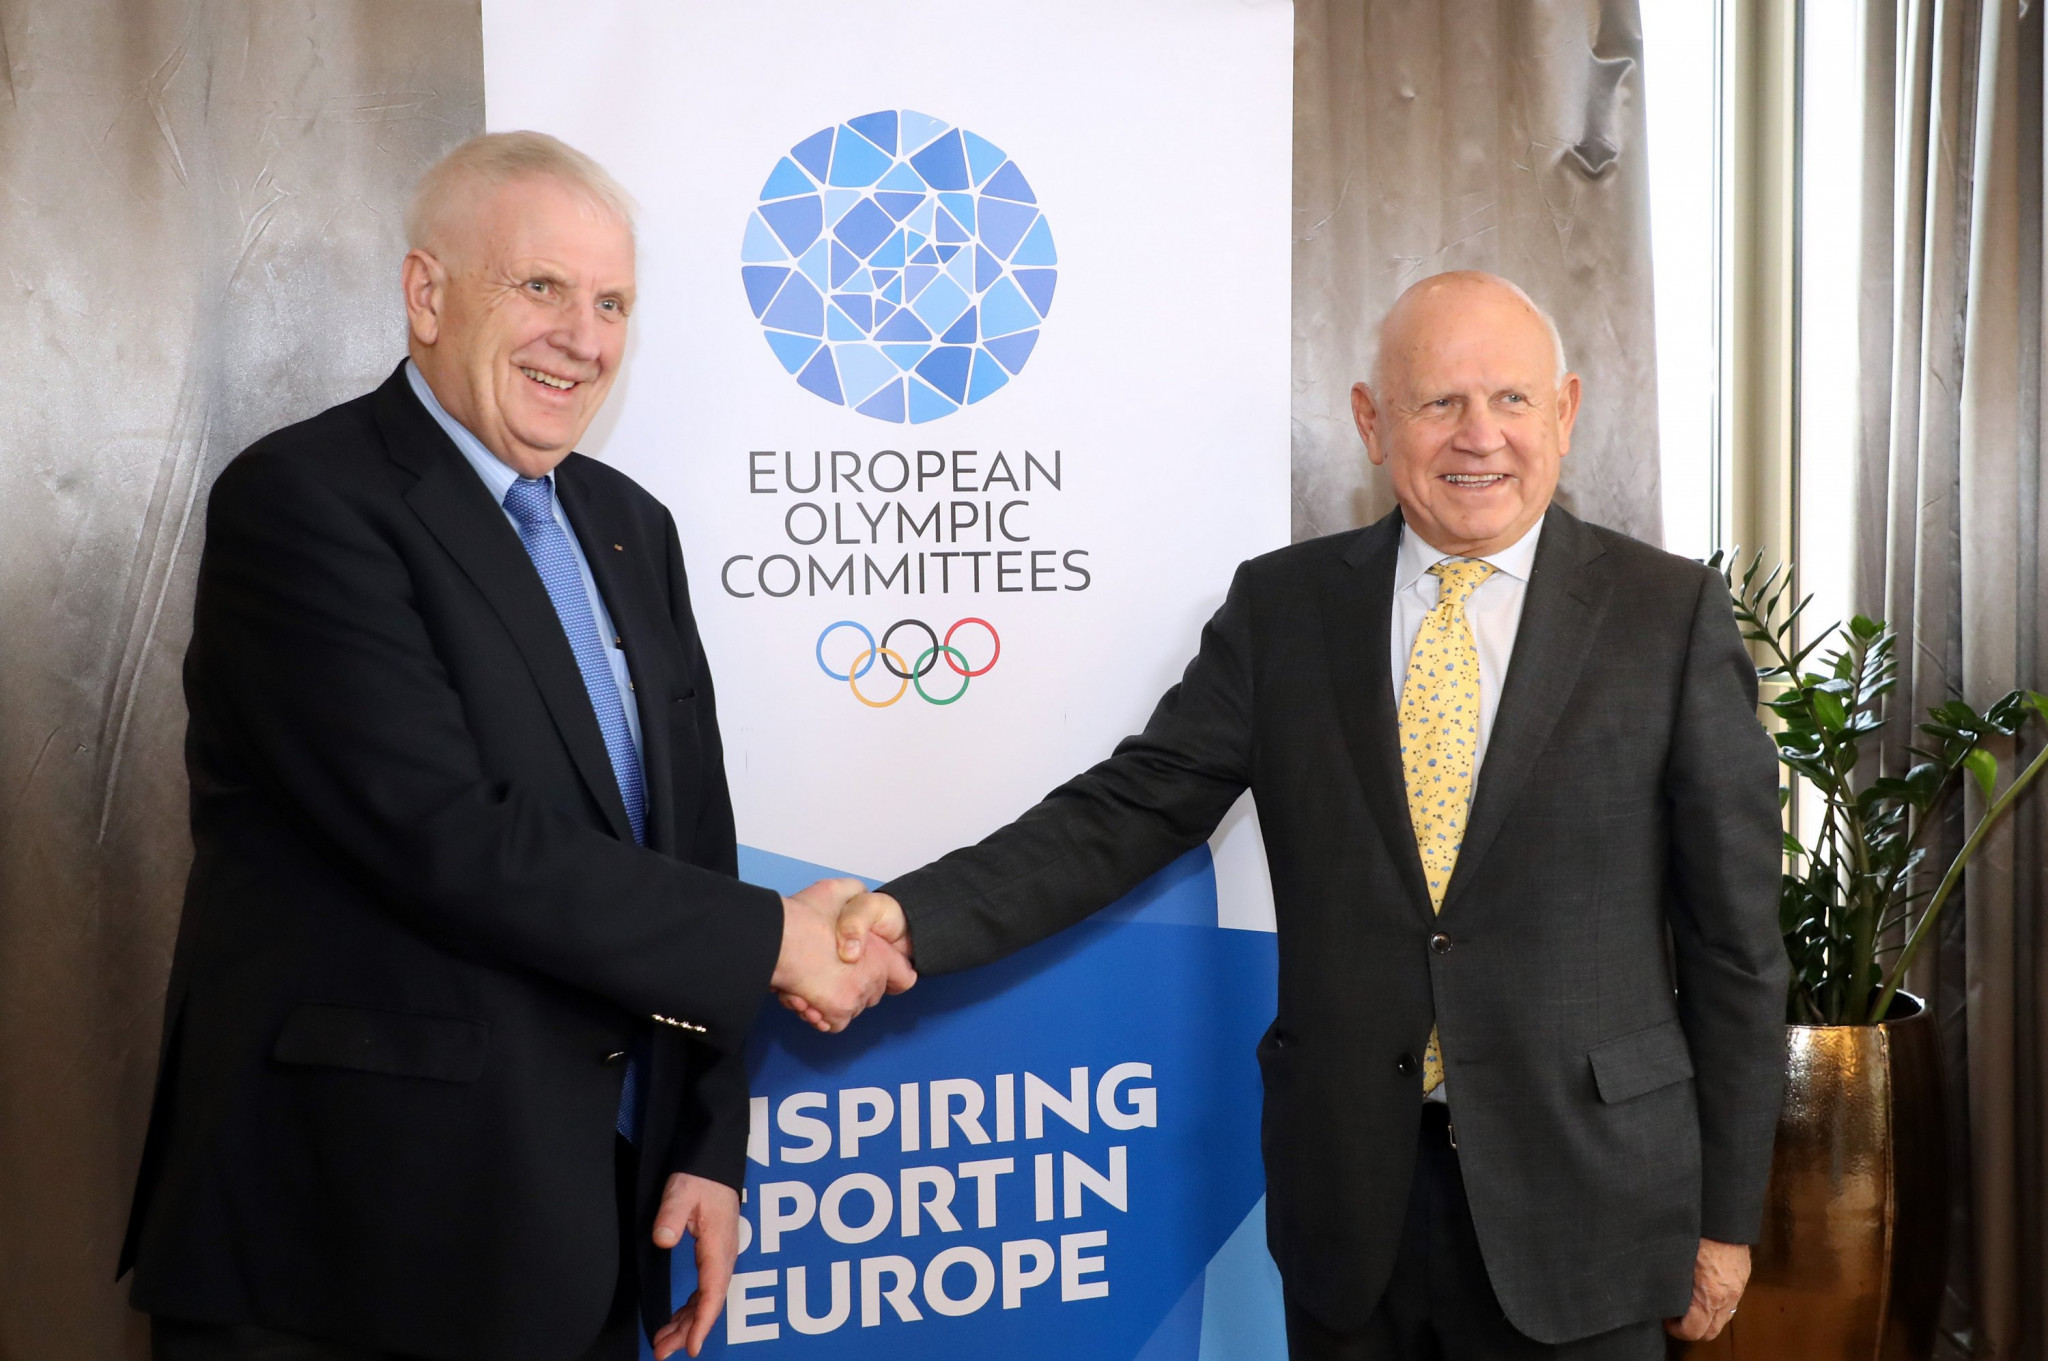 European Athletics President Svein Arne Hansen, left, with EOC counterpart Janez Kocijančič ©EOC